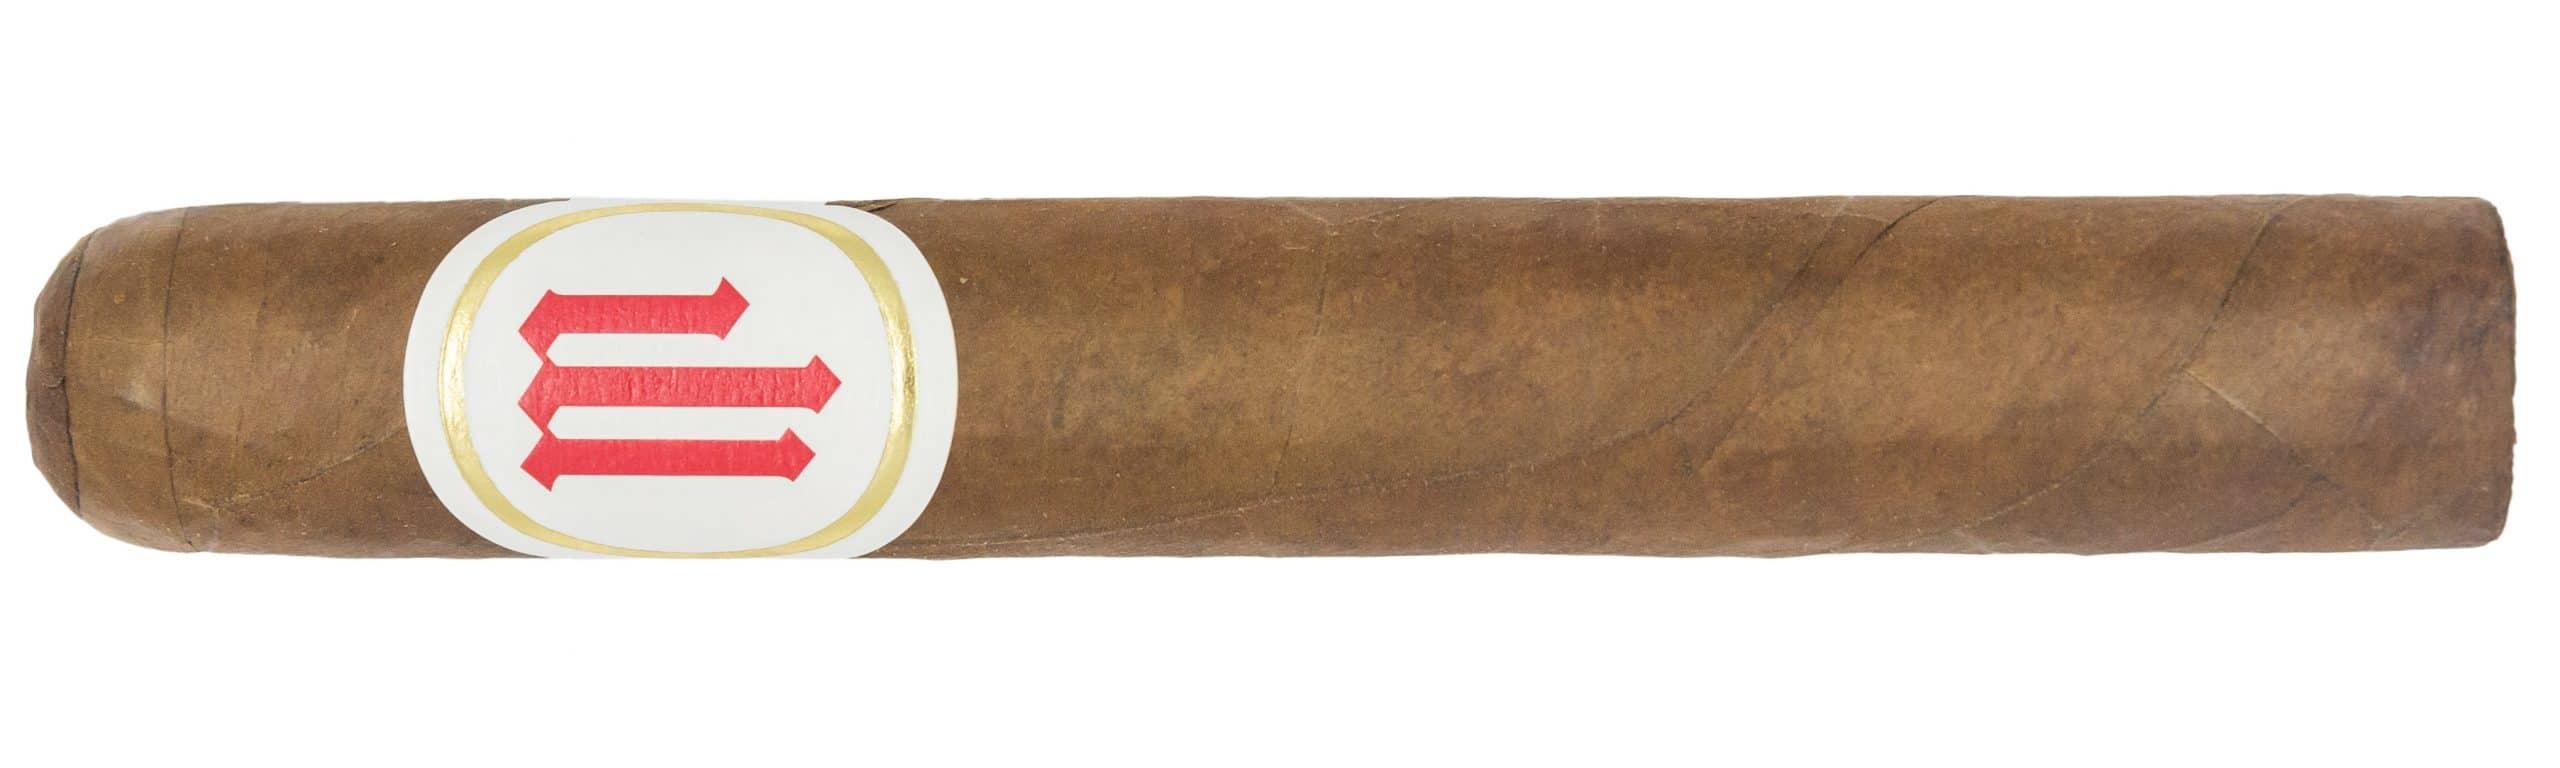 Blind Cigar Review: Crowned Heads | Mil Días Edmundo